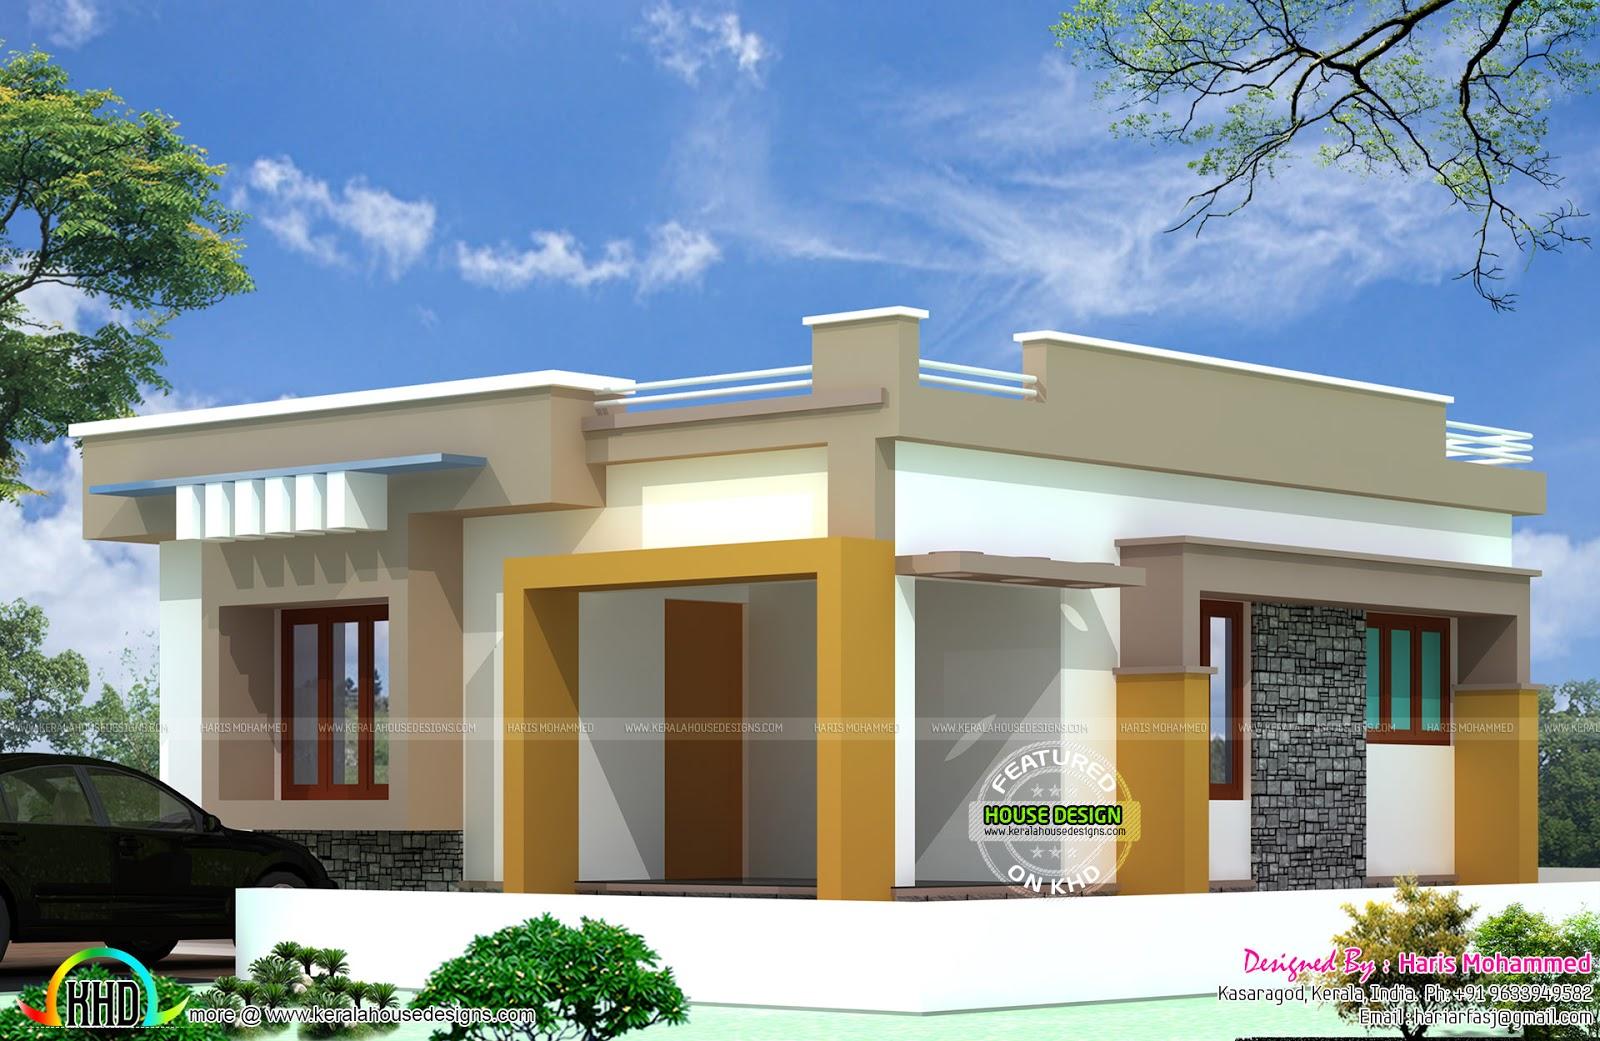 10 Lakhs Budget House Plan Kerala Home Design And Floor